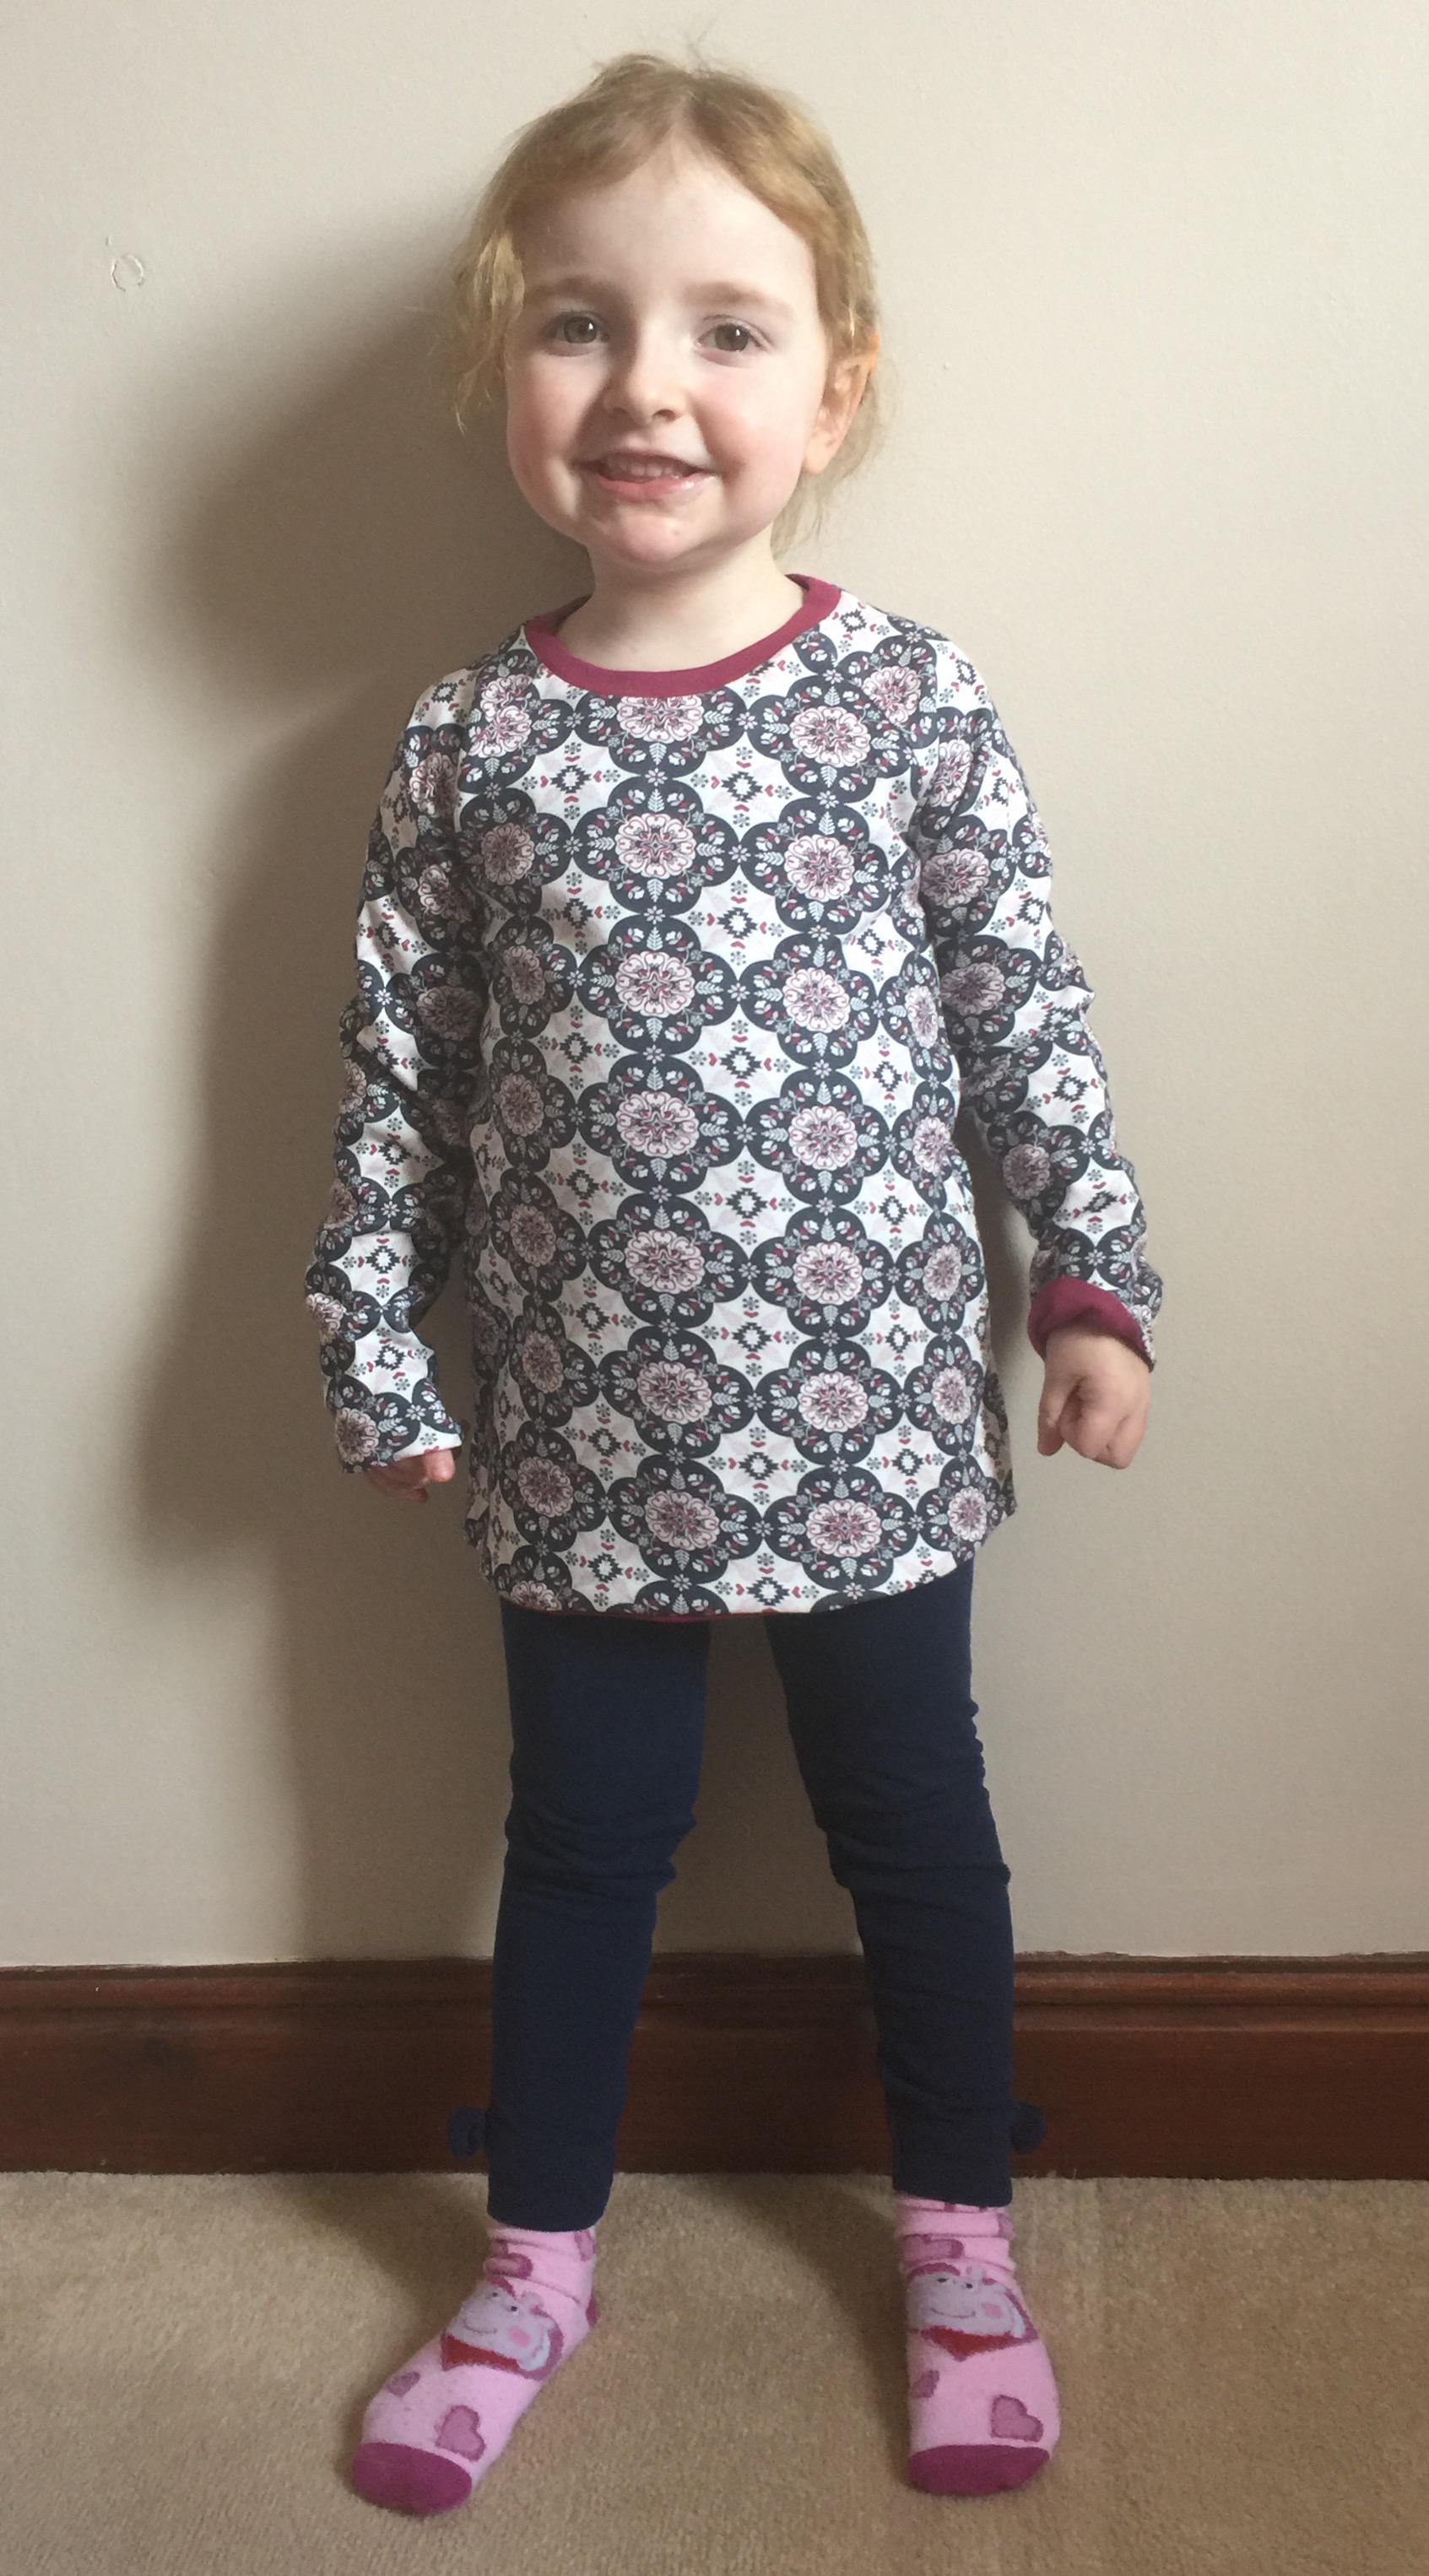 Comfortable Yet Stylish Children's Clothing With Sense Organics